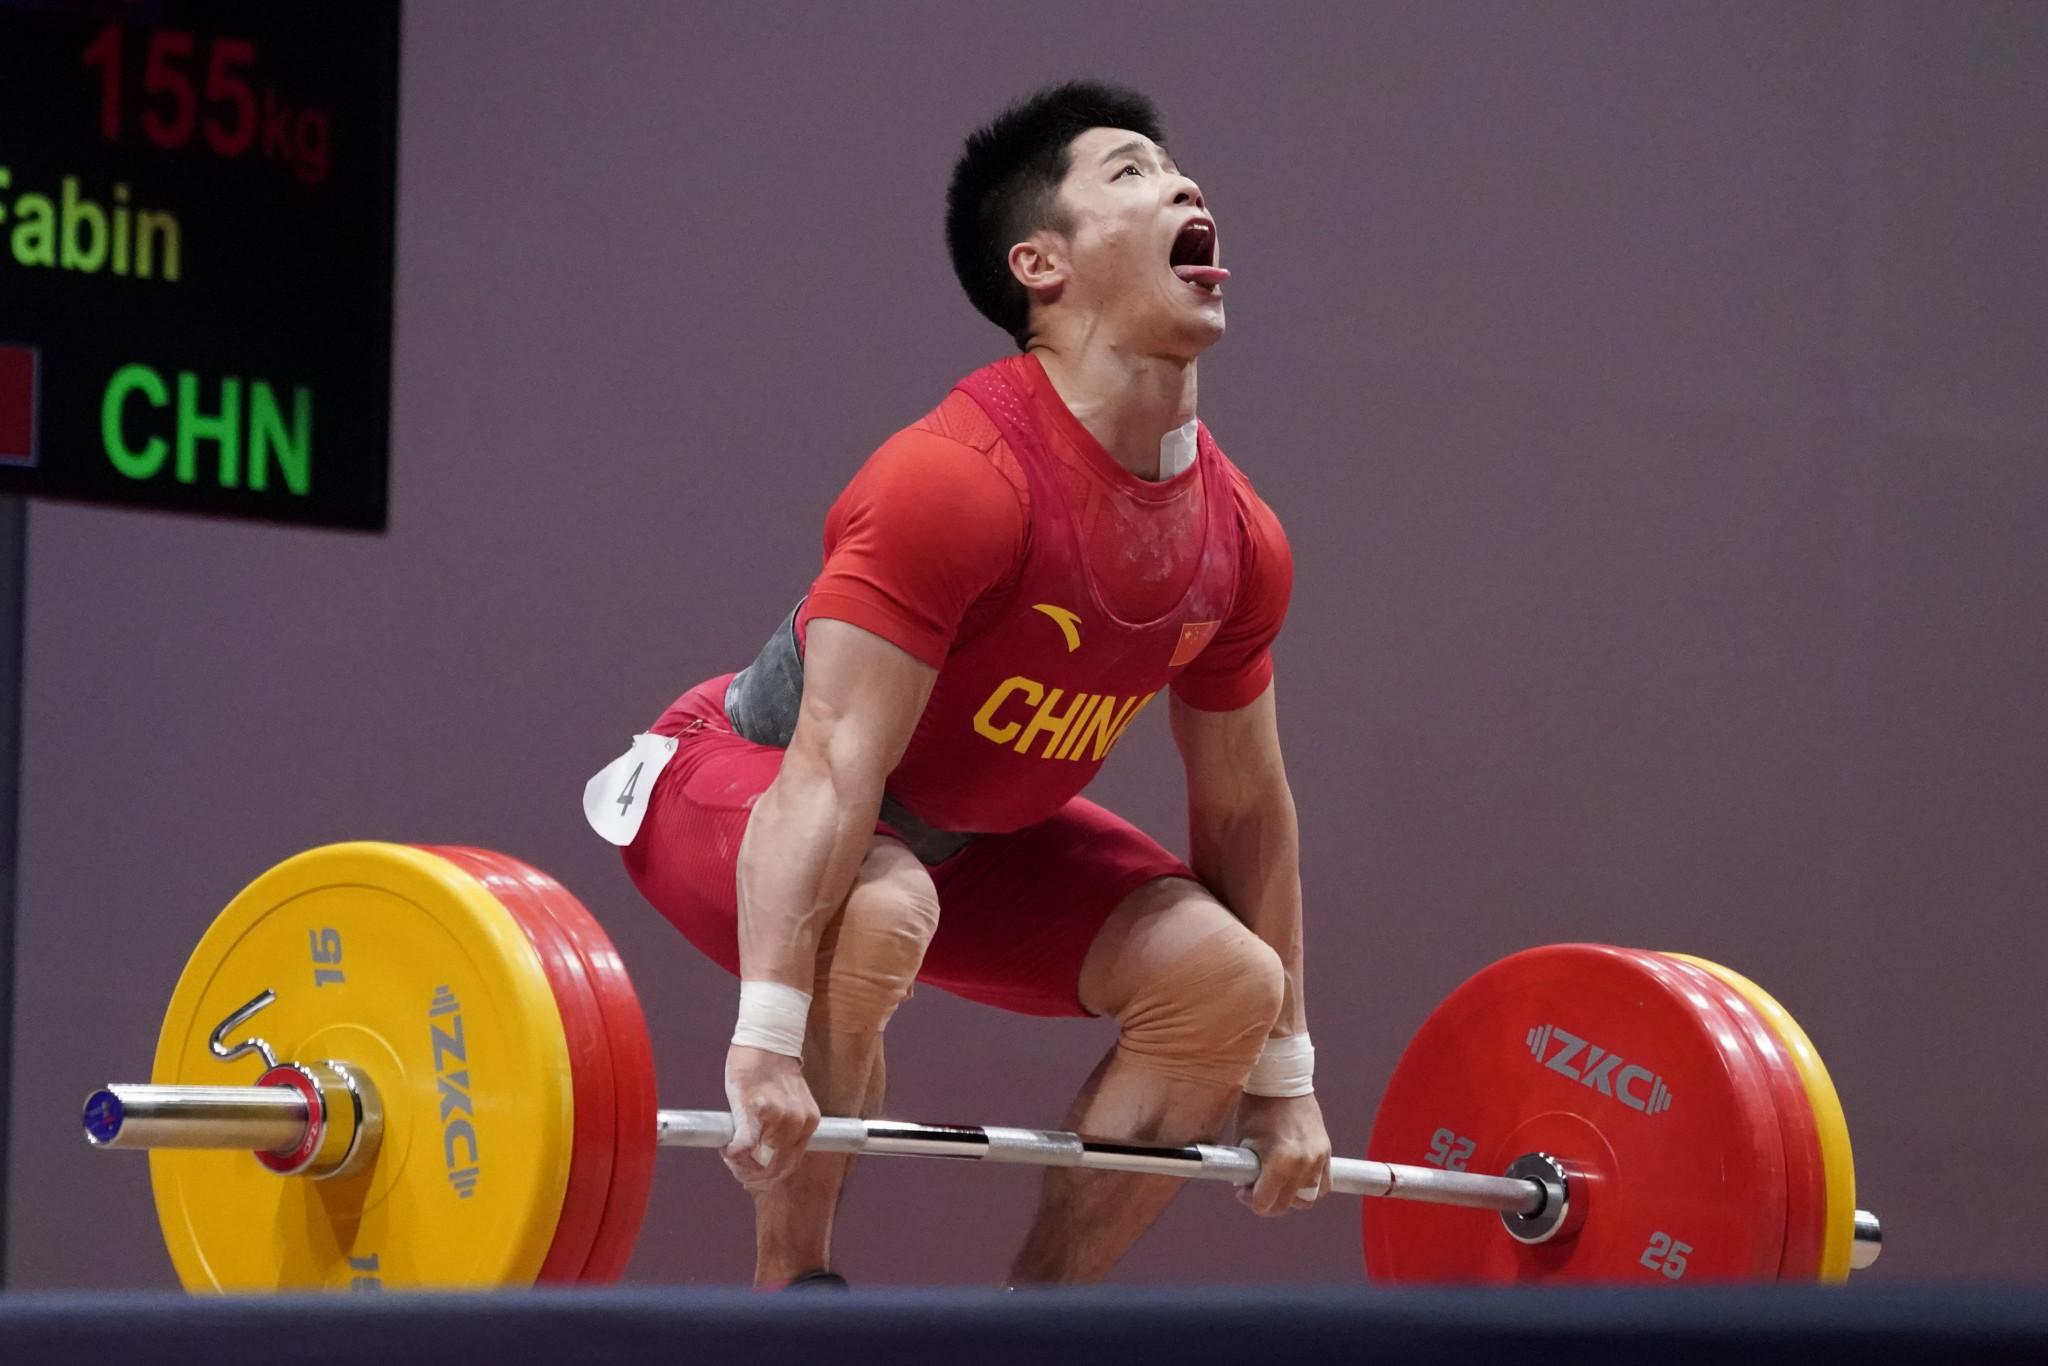 Li Fabin tops the world rankings for 61kg but is only narrowly ahead of nearest rival Indonesia's Eko Yuli Irawan ©Getty Images